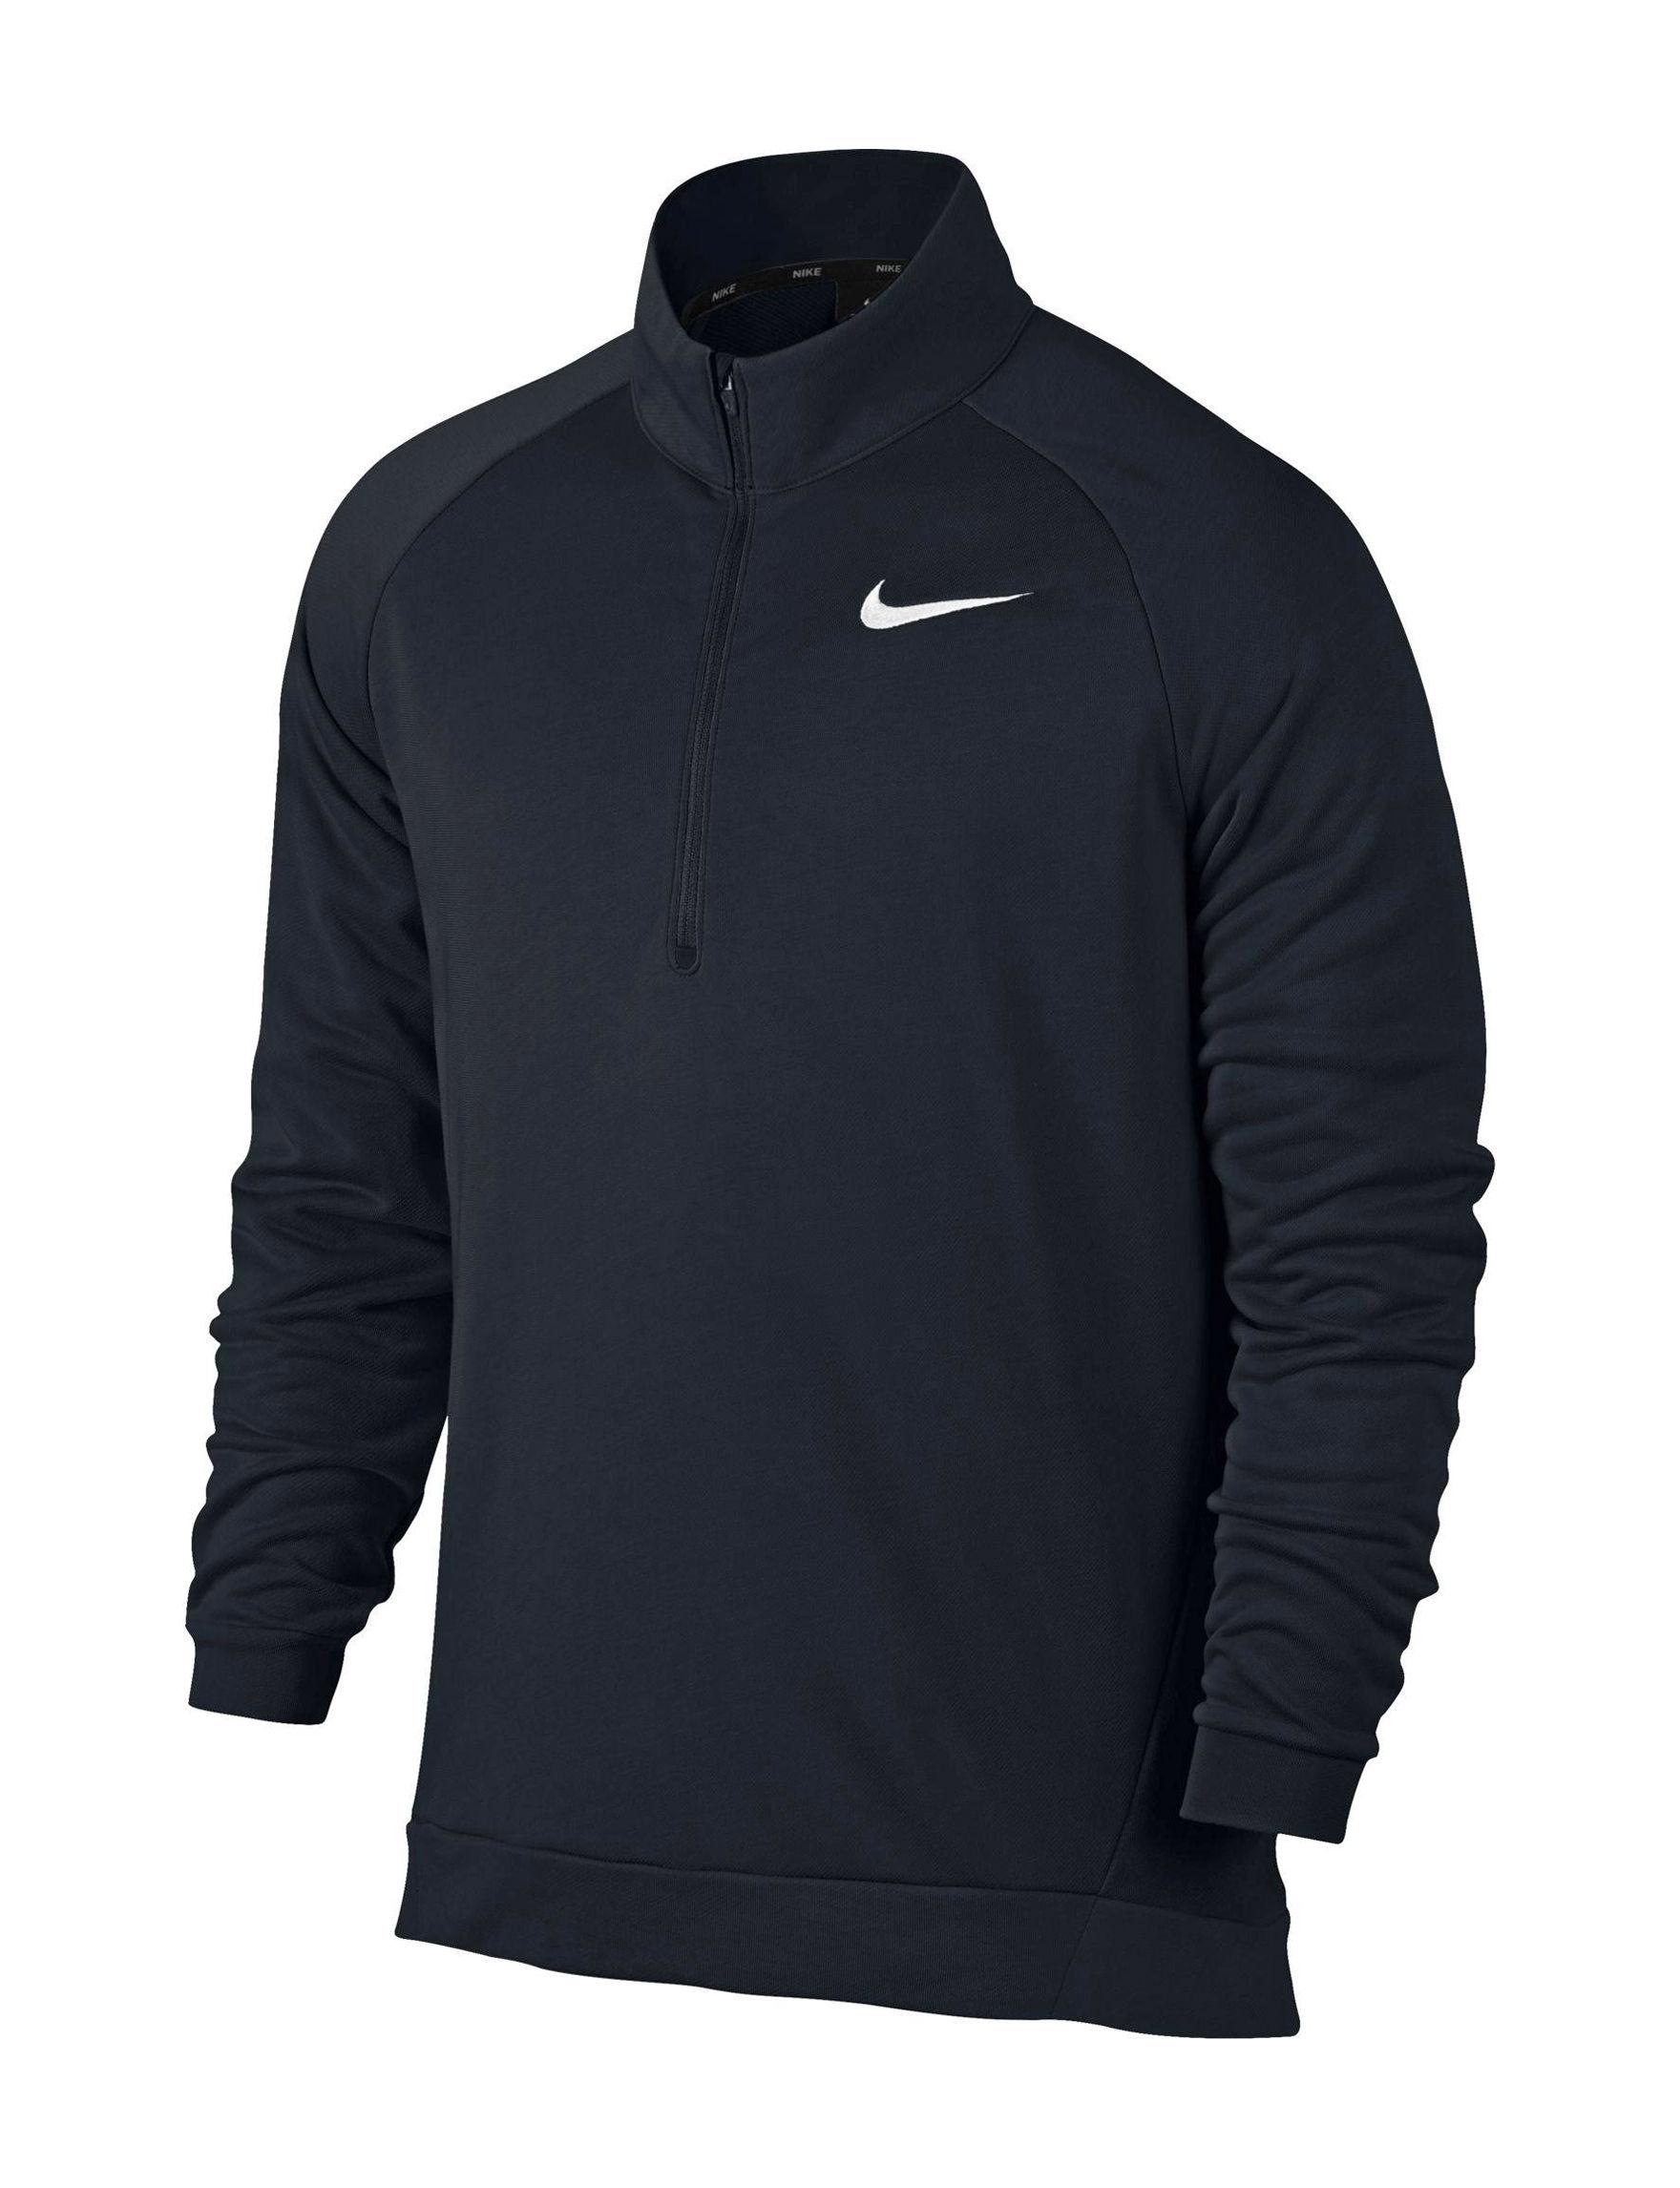 Nike Black Pull-overs